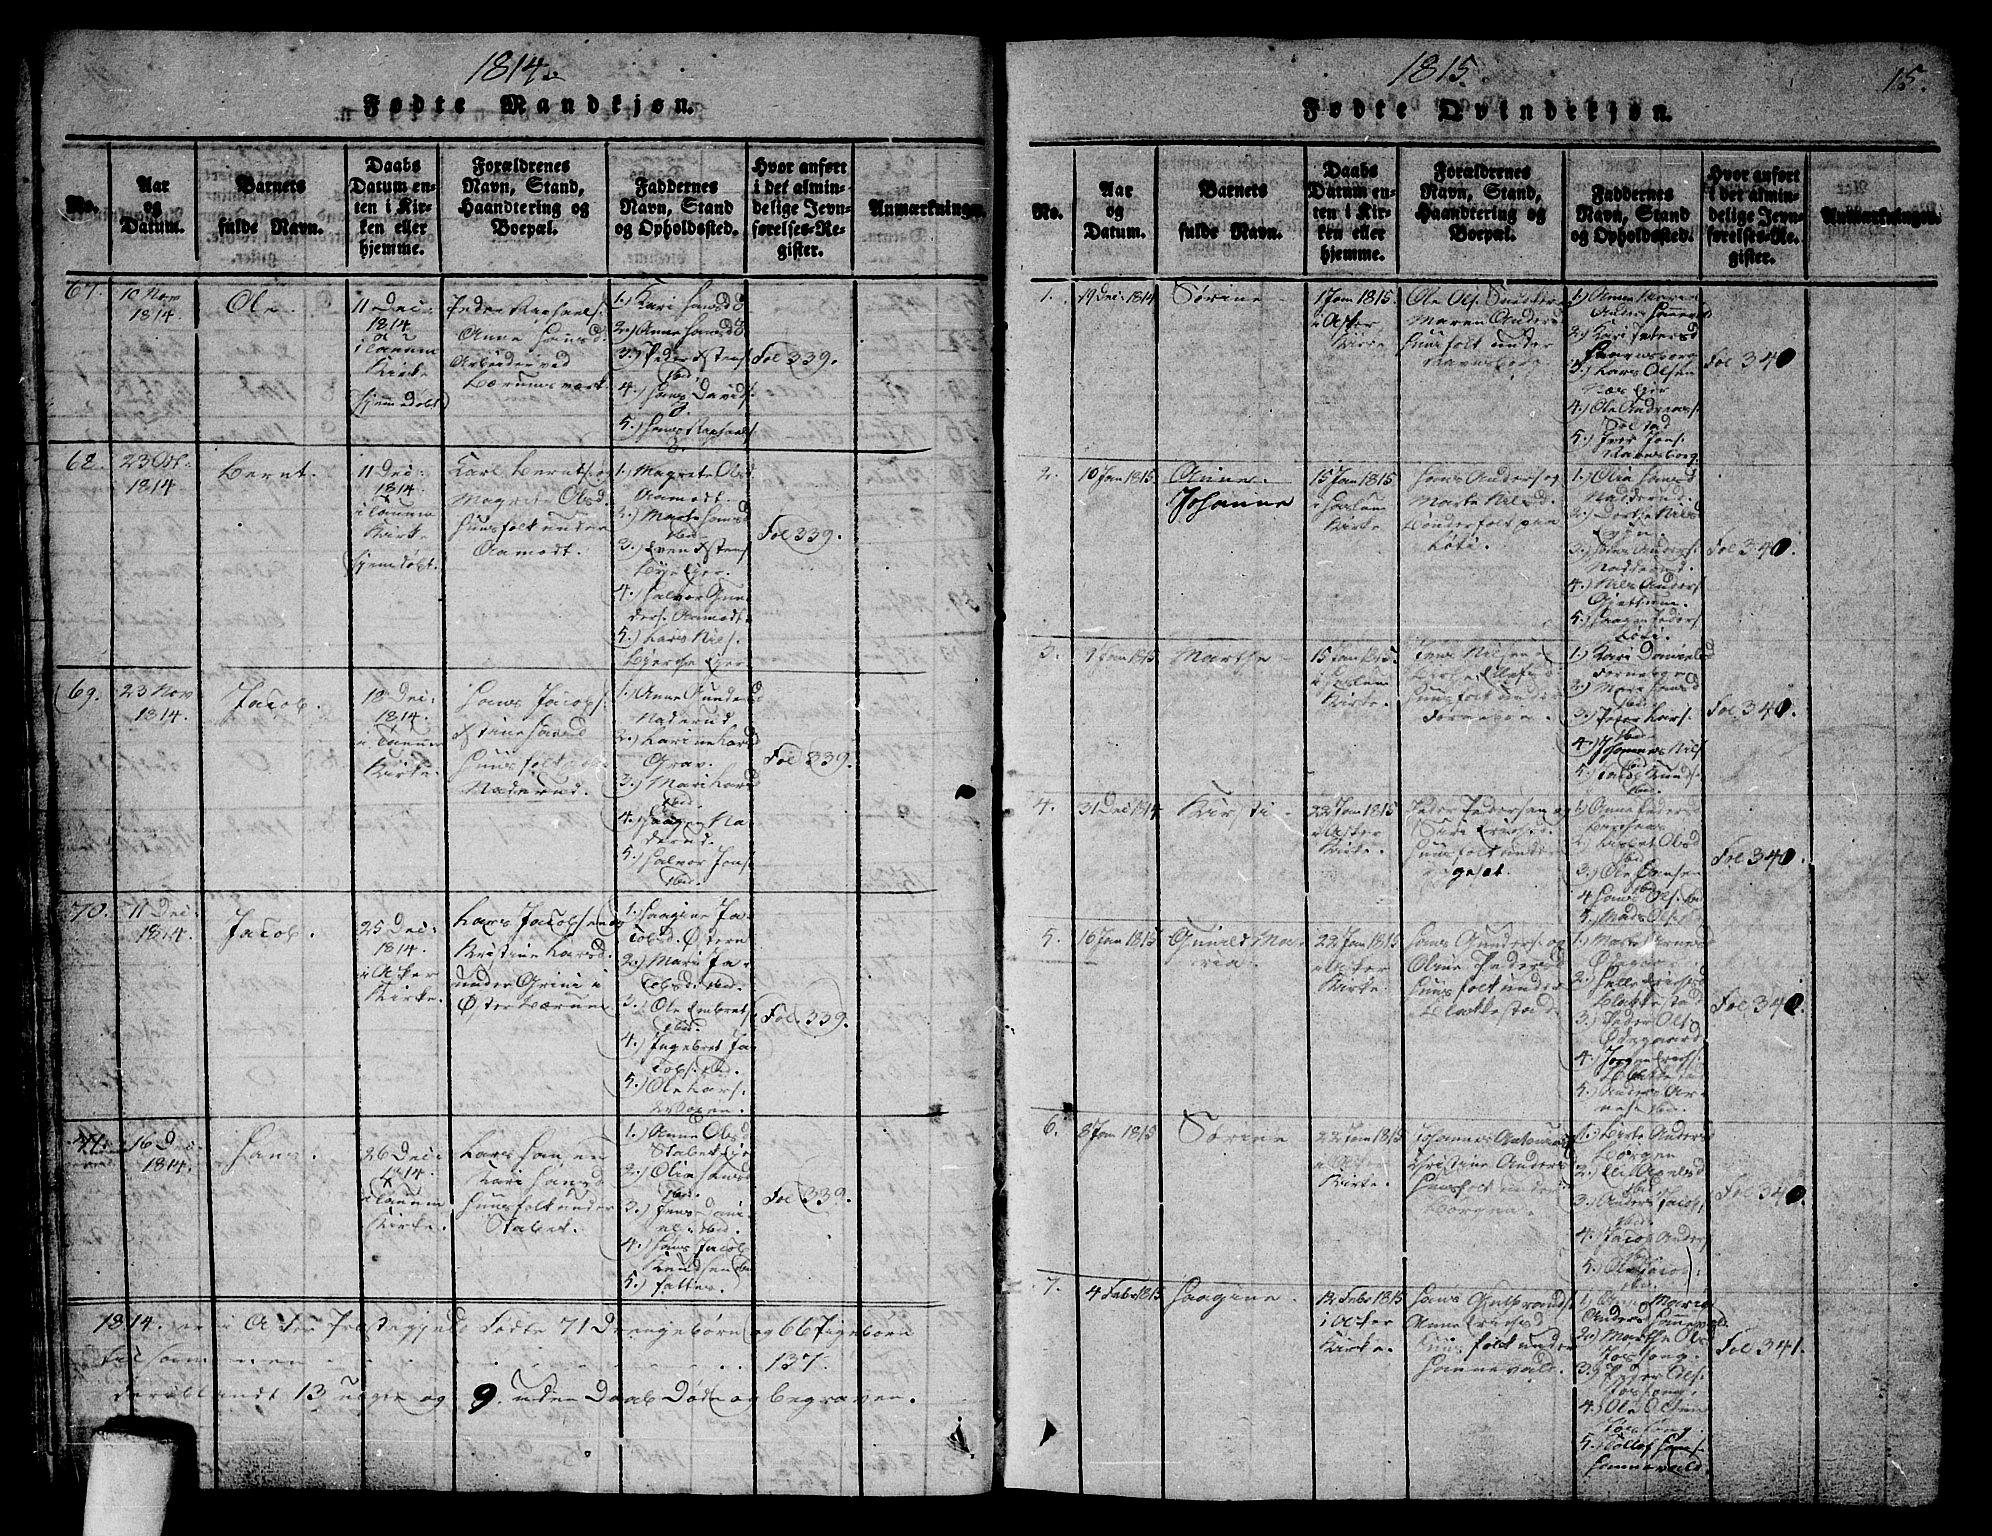 SAO, Asker prestekontor Kirkebøker, G/Ga/L0001: Klokkerbok nr. I 1, 1814-1830, s. 15